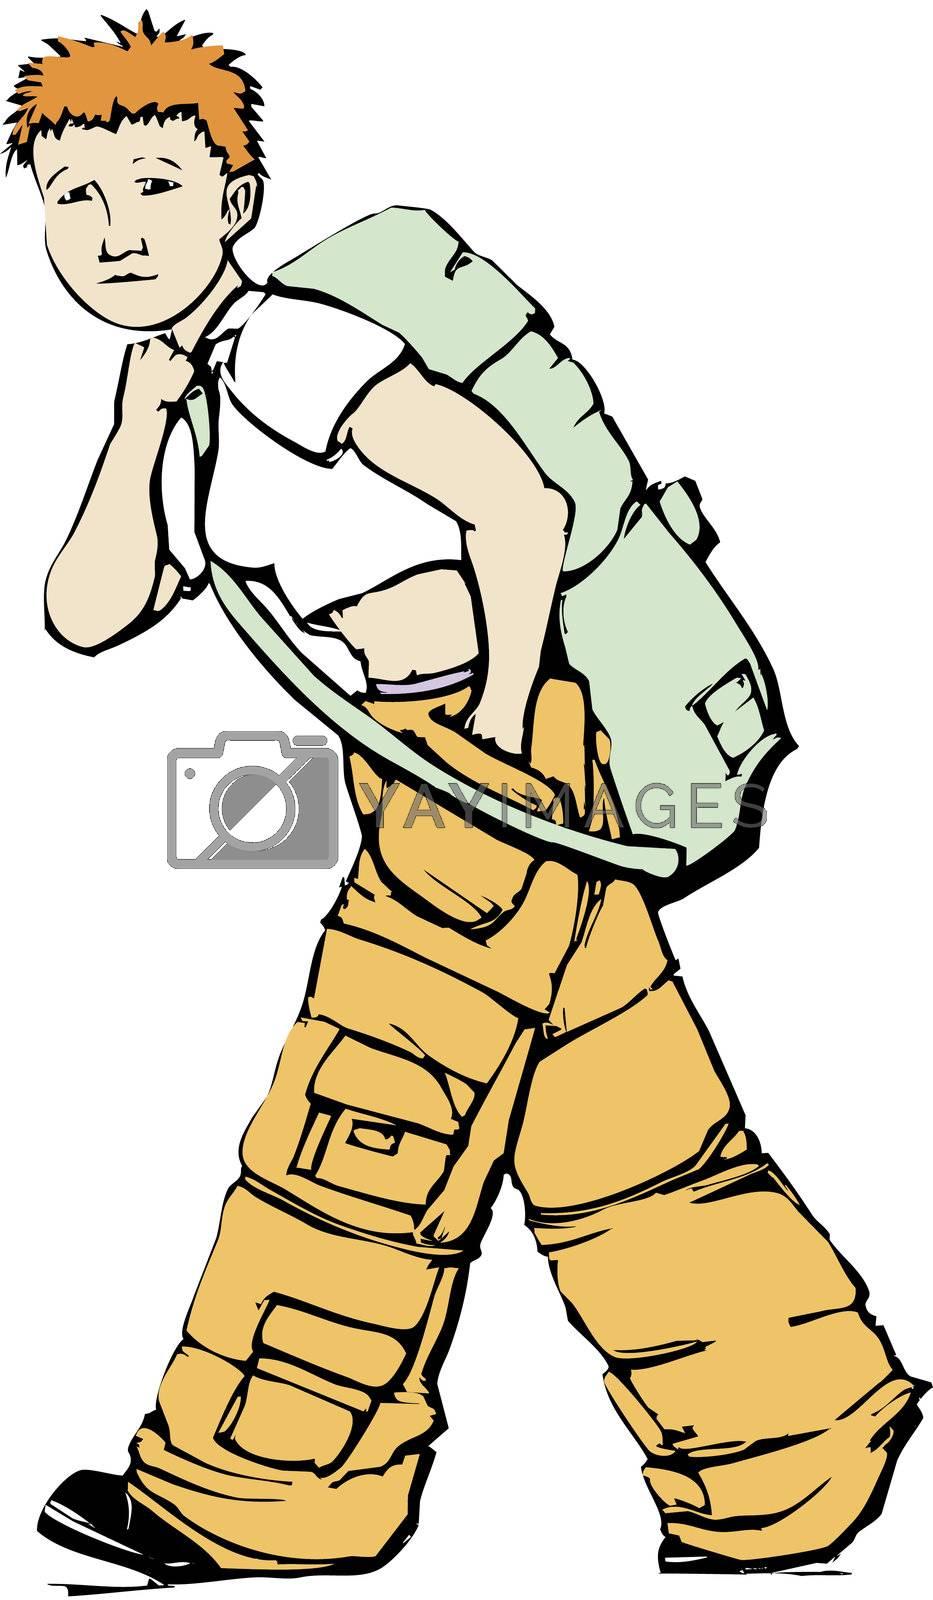 Girl in cargo pants carries an army green duffel bag.